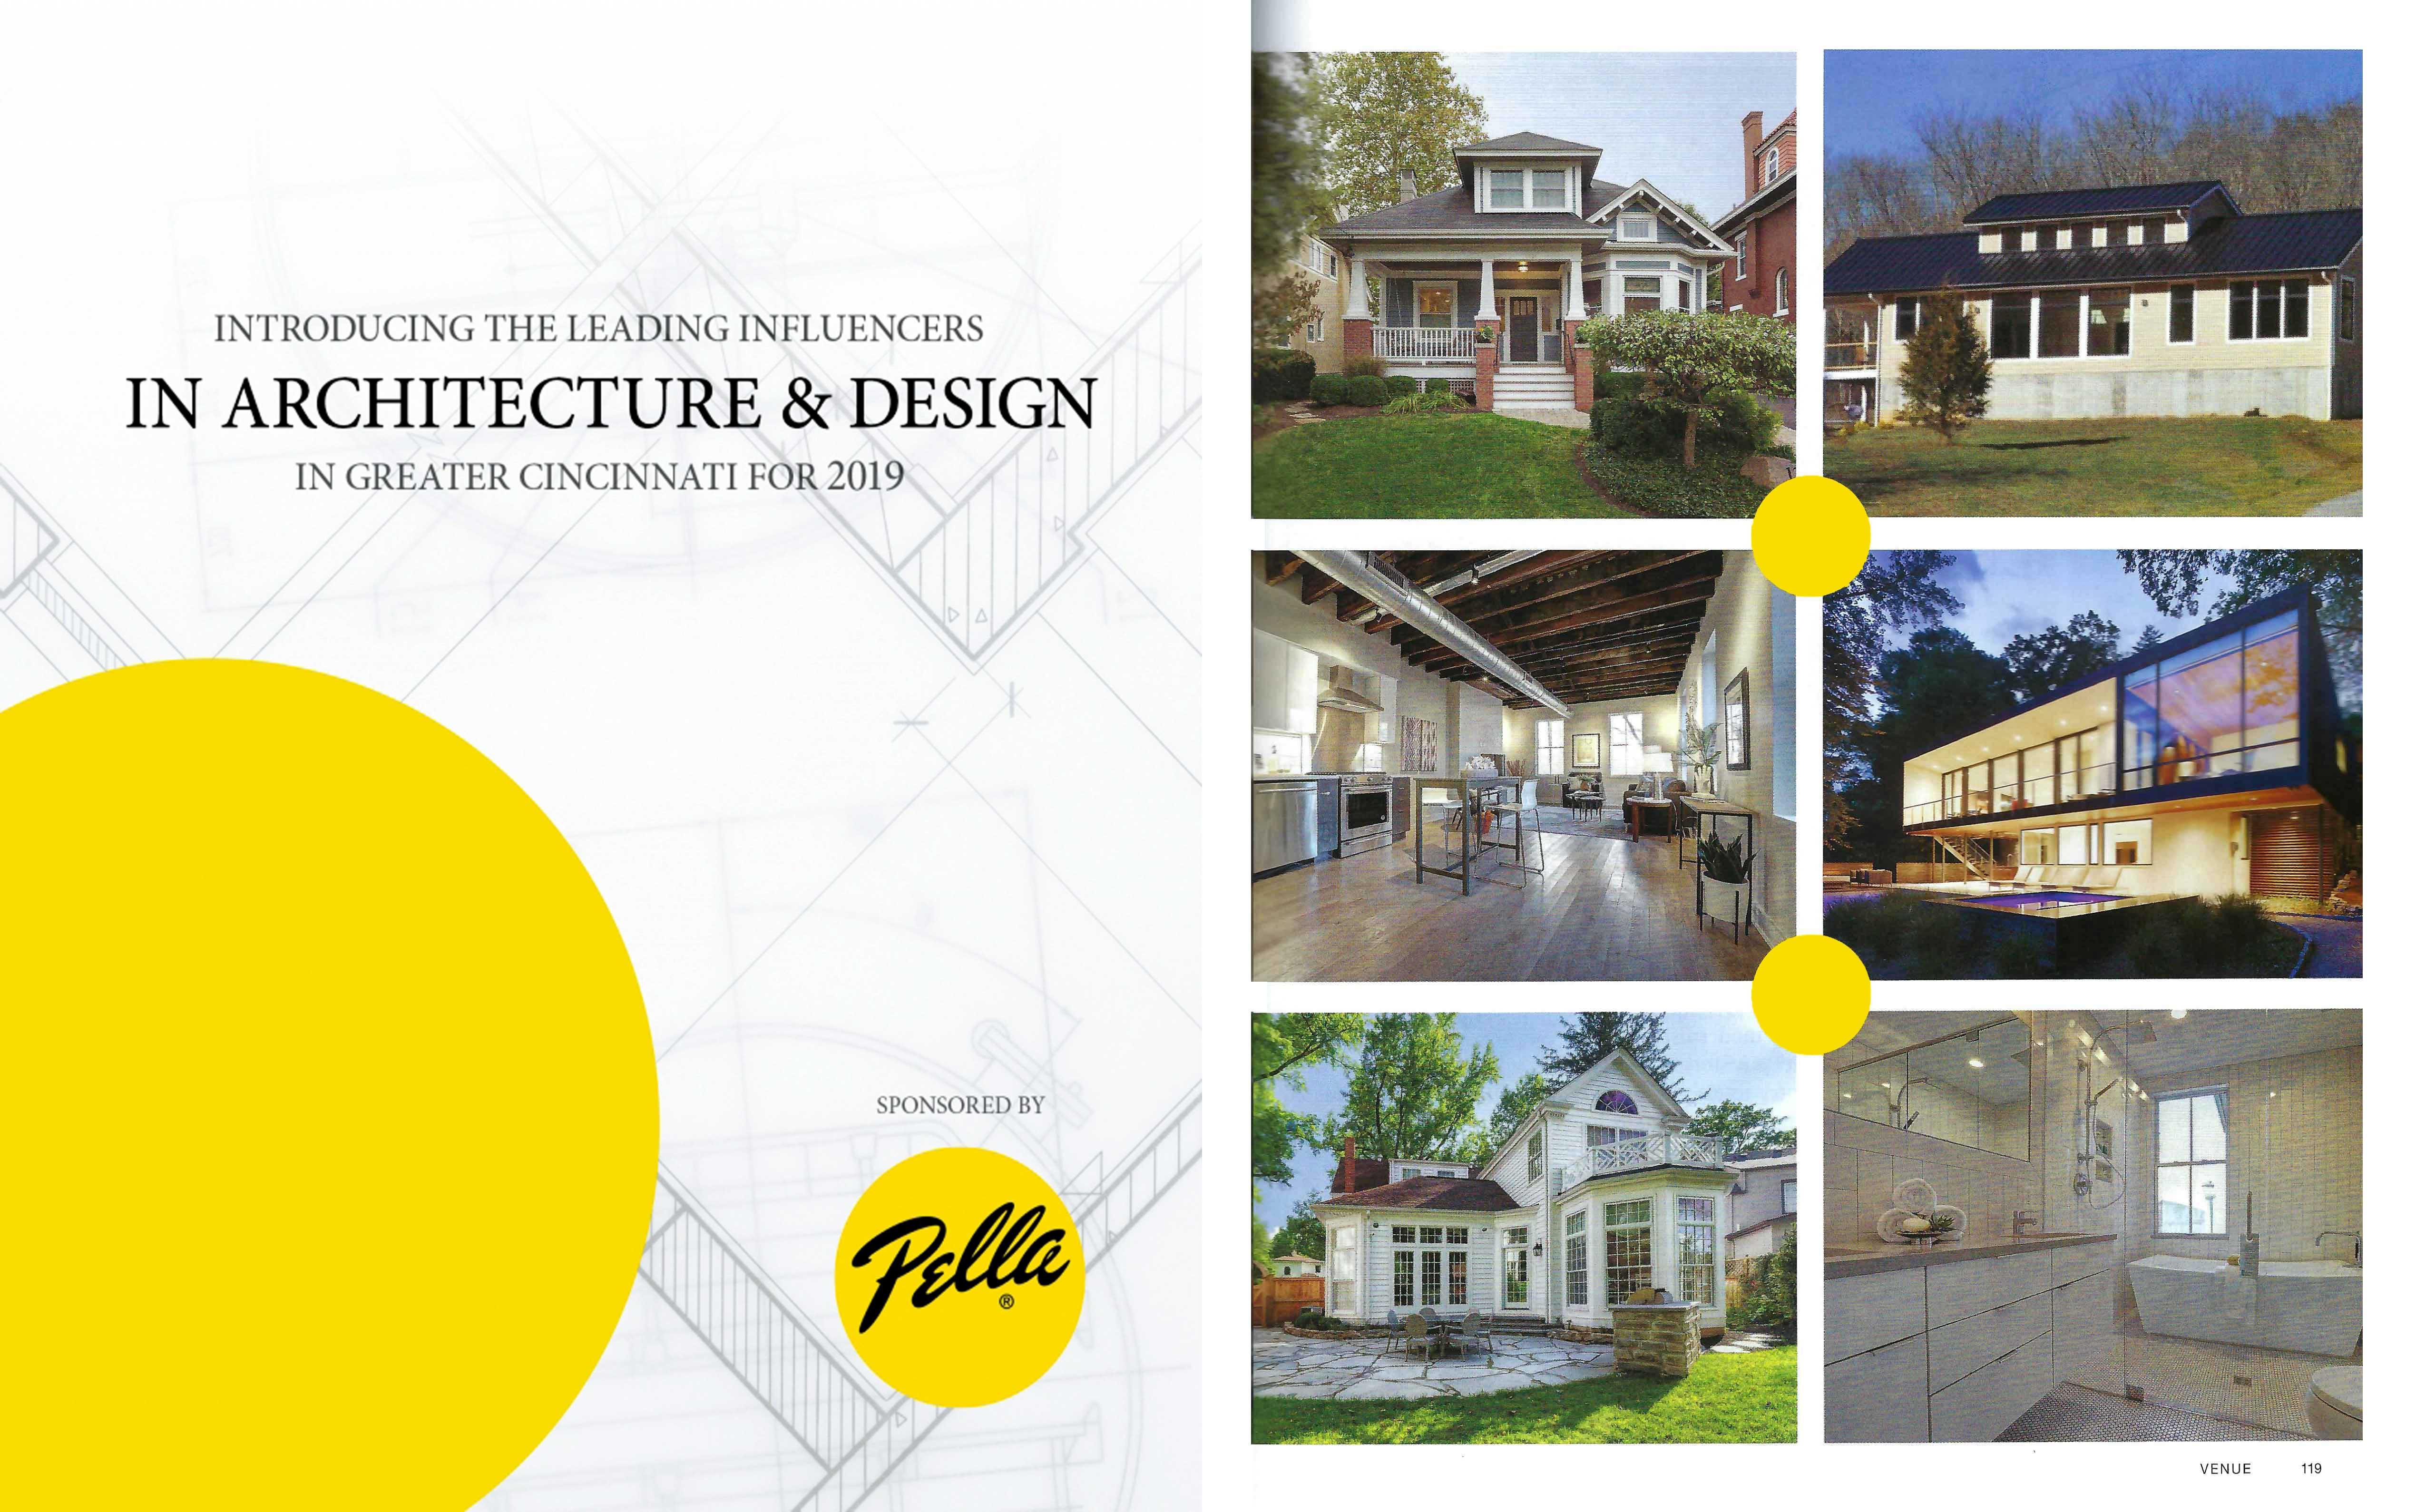 Venue Magazine article spread featuring Wilcox Architecture as a Leading Influencer in Architecture & Design in Greater Cincinnati